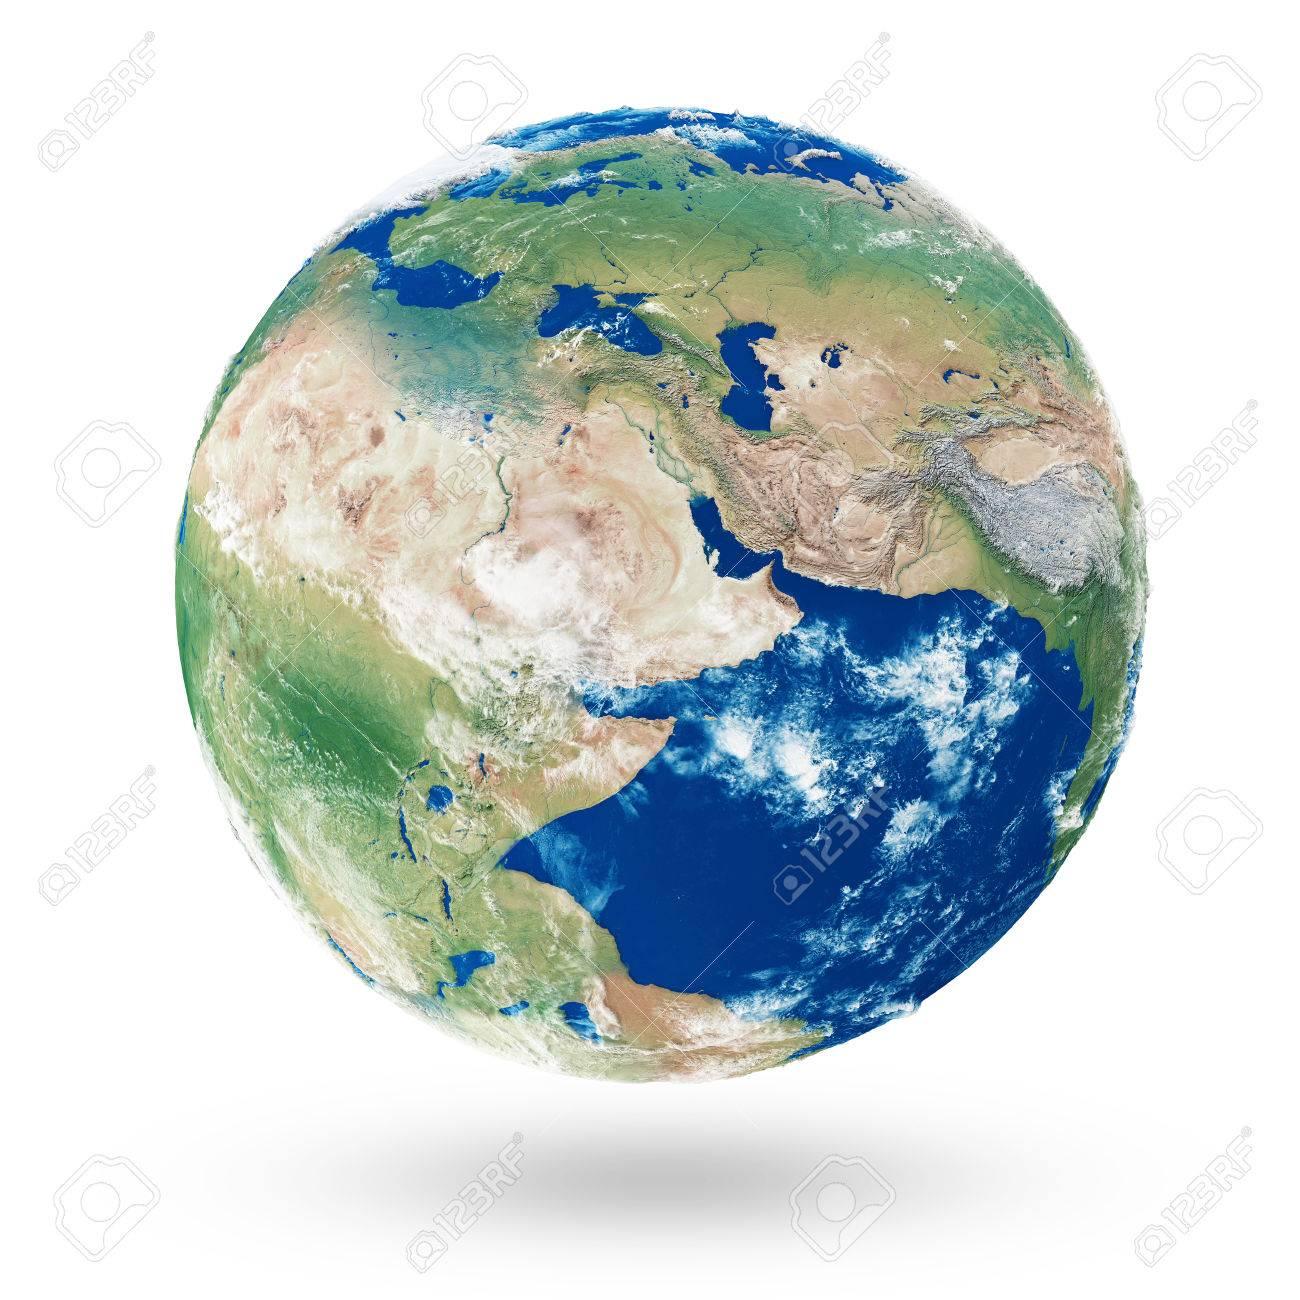 Earth planet 200 million years ago the pangaea continent elements earth planet 200 million years ago the pangaea continent elements of this image furnished publicscrutiny Choice Image